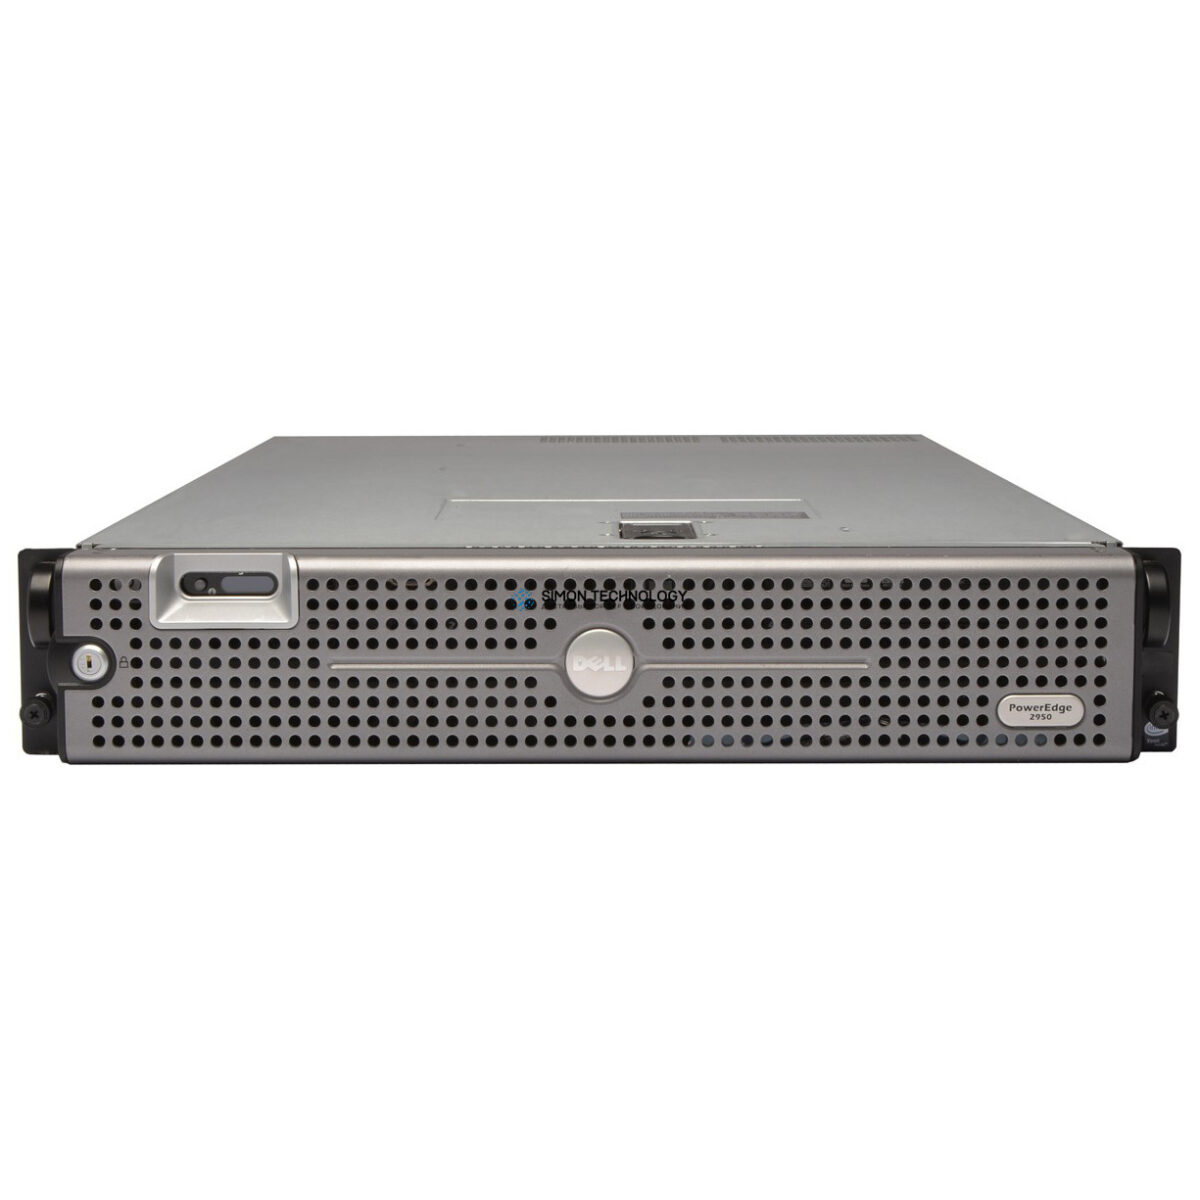 Сервер Dell PE 2950 III 6X3.5 2XE5440 (PE2950III-1X6-E5440)